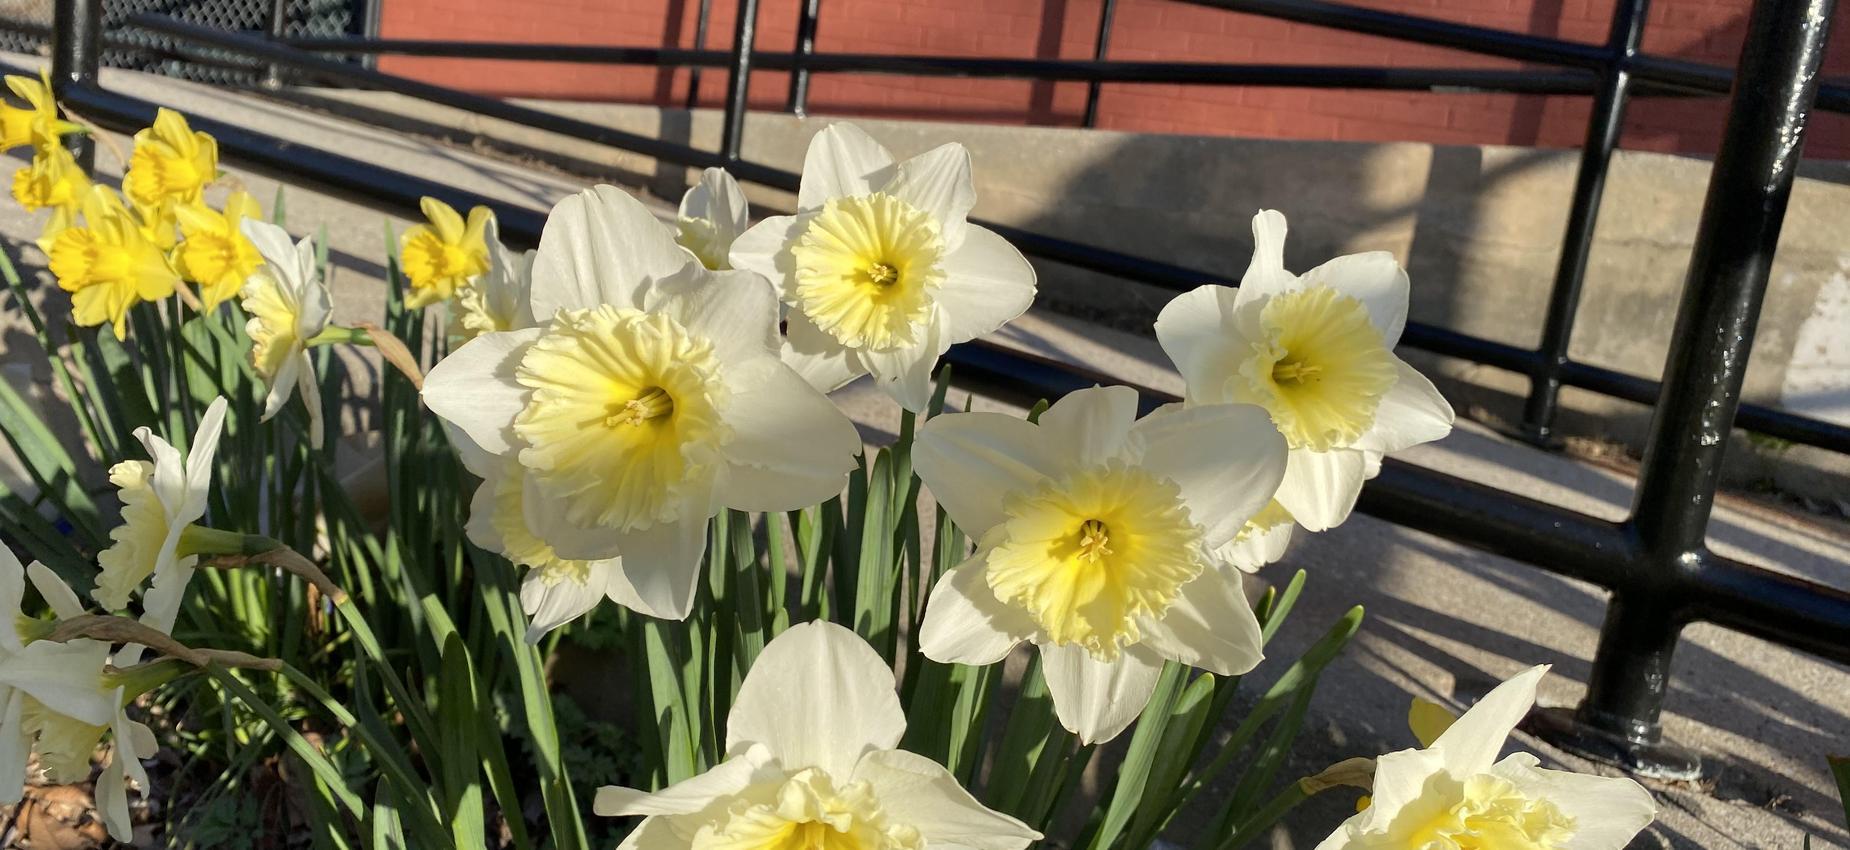 Daffodils in the school yard